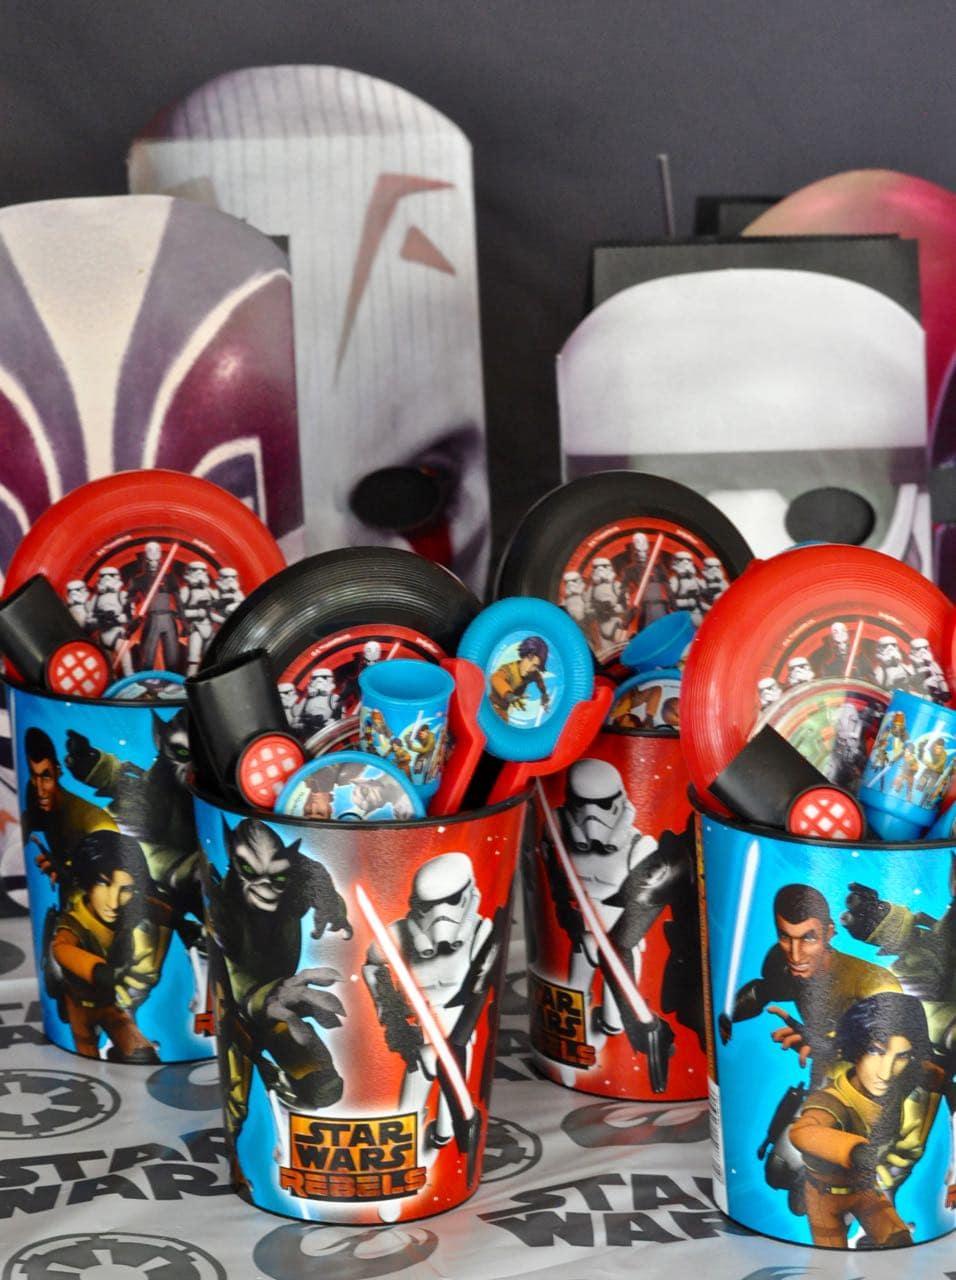 Star Wars Rebels Party